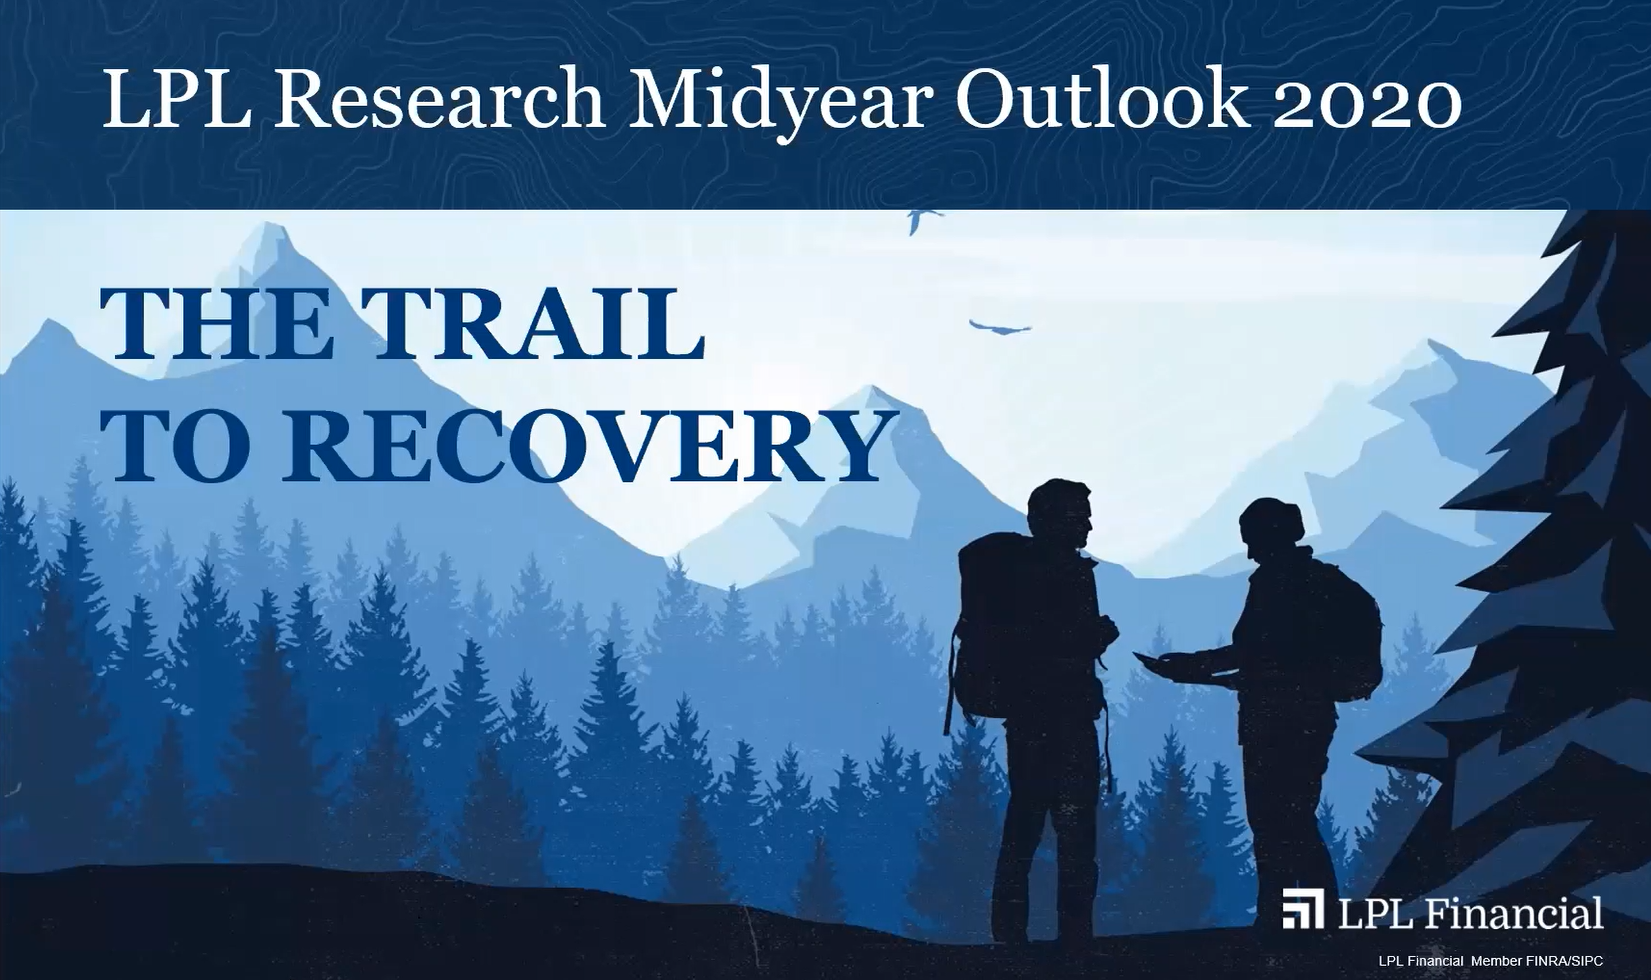 LPL Research Midyear Outlook July 2020 Thumbnail